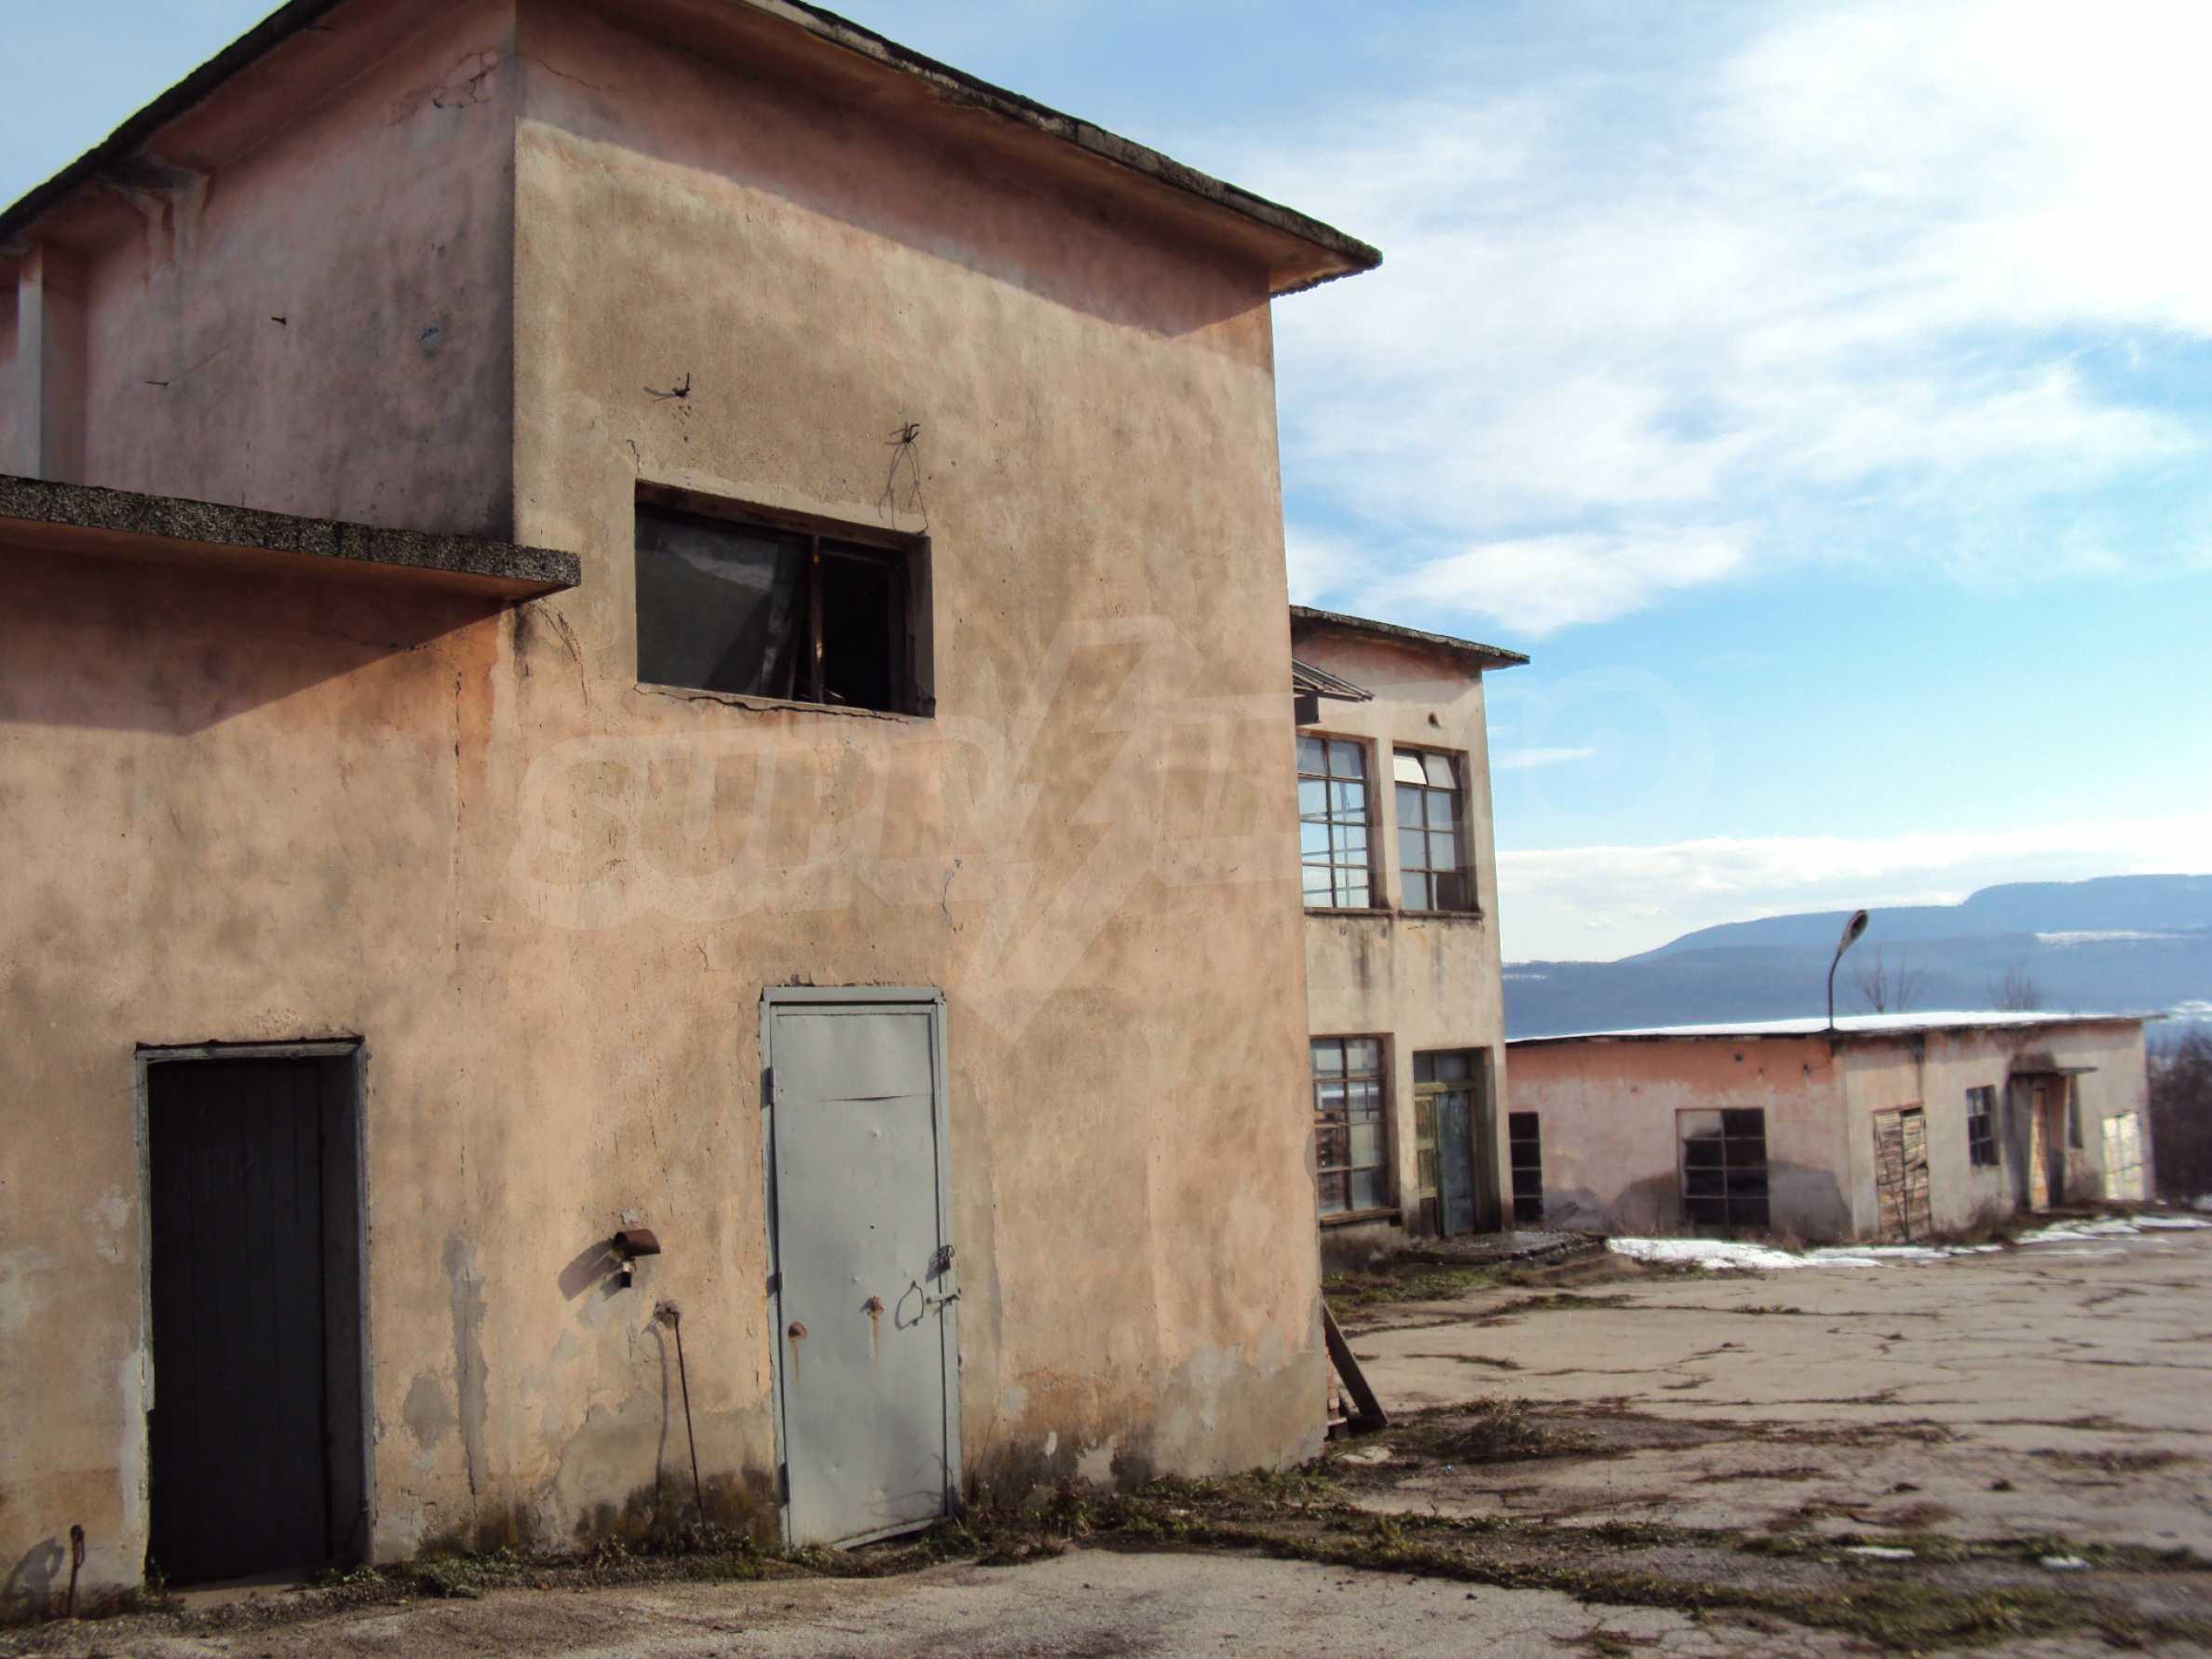 Fabrik in der Nähe von Veliko Tarnovo 27